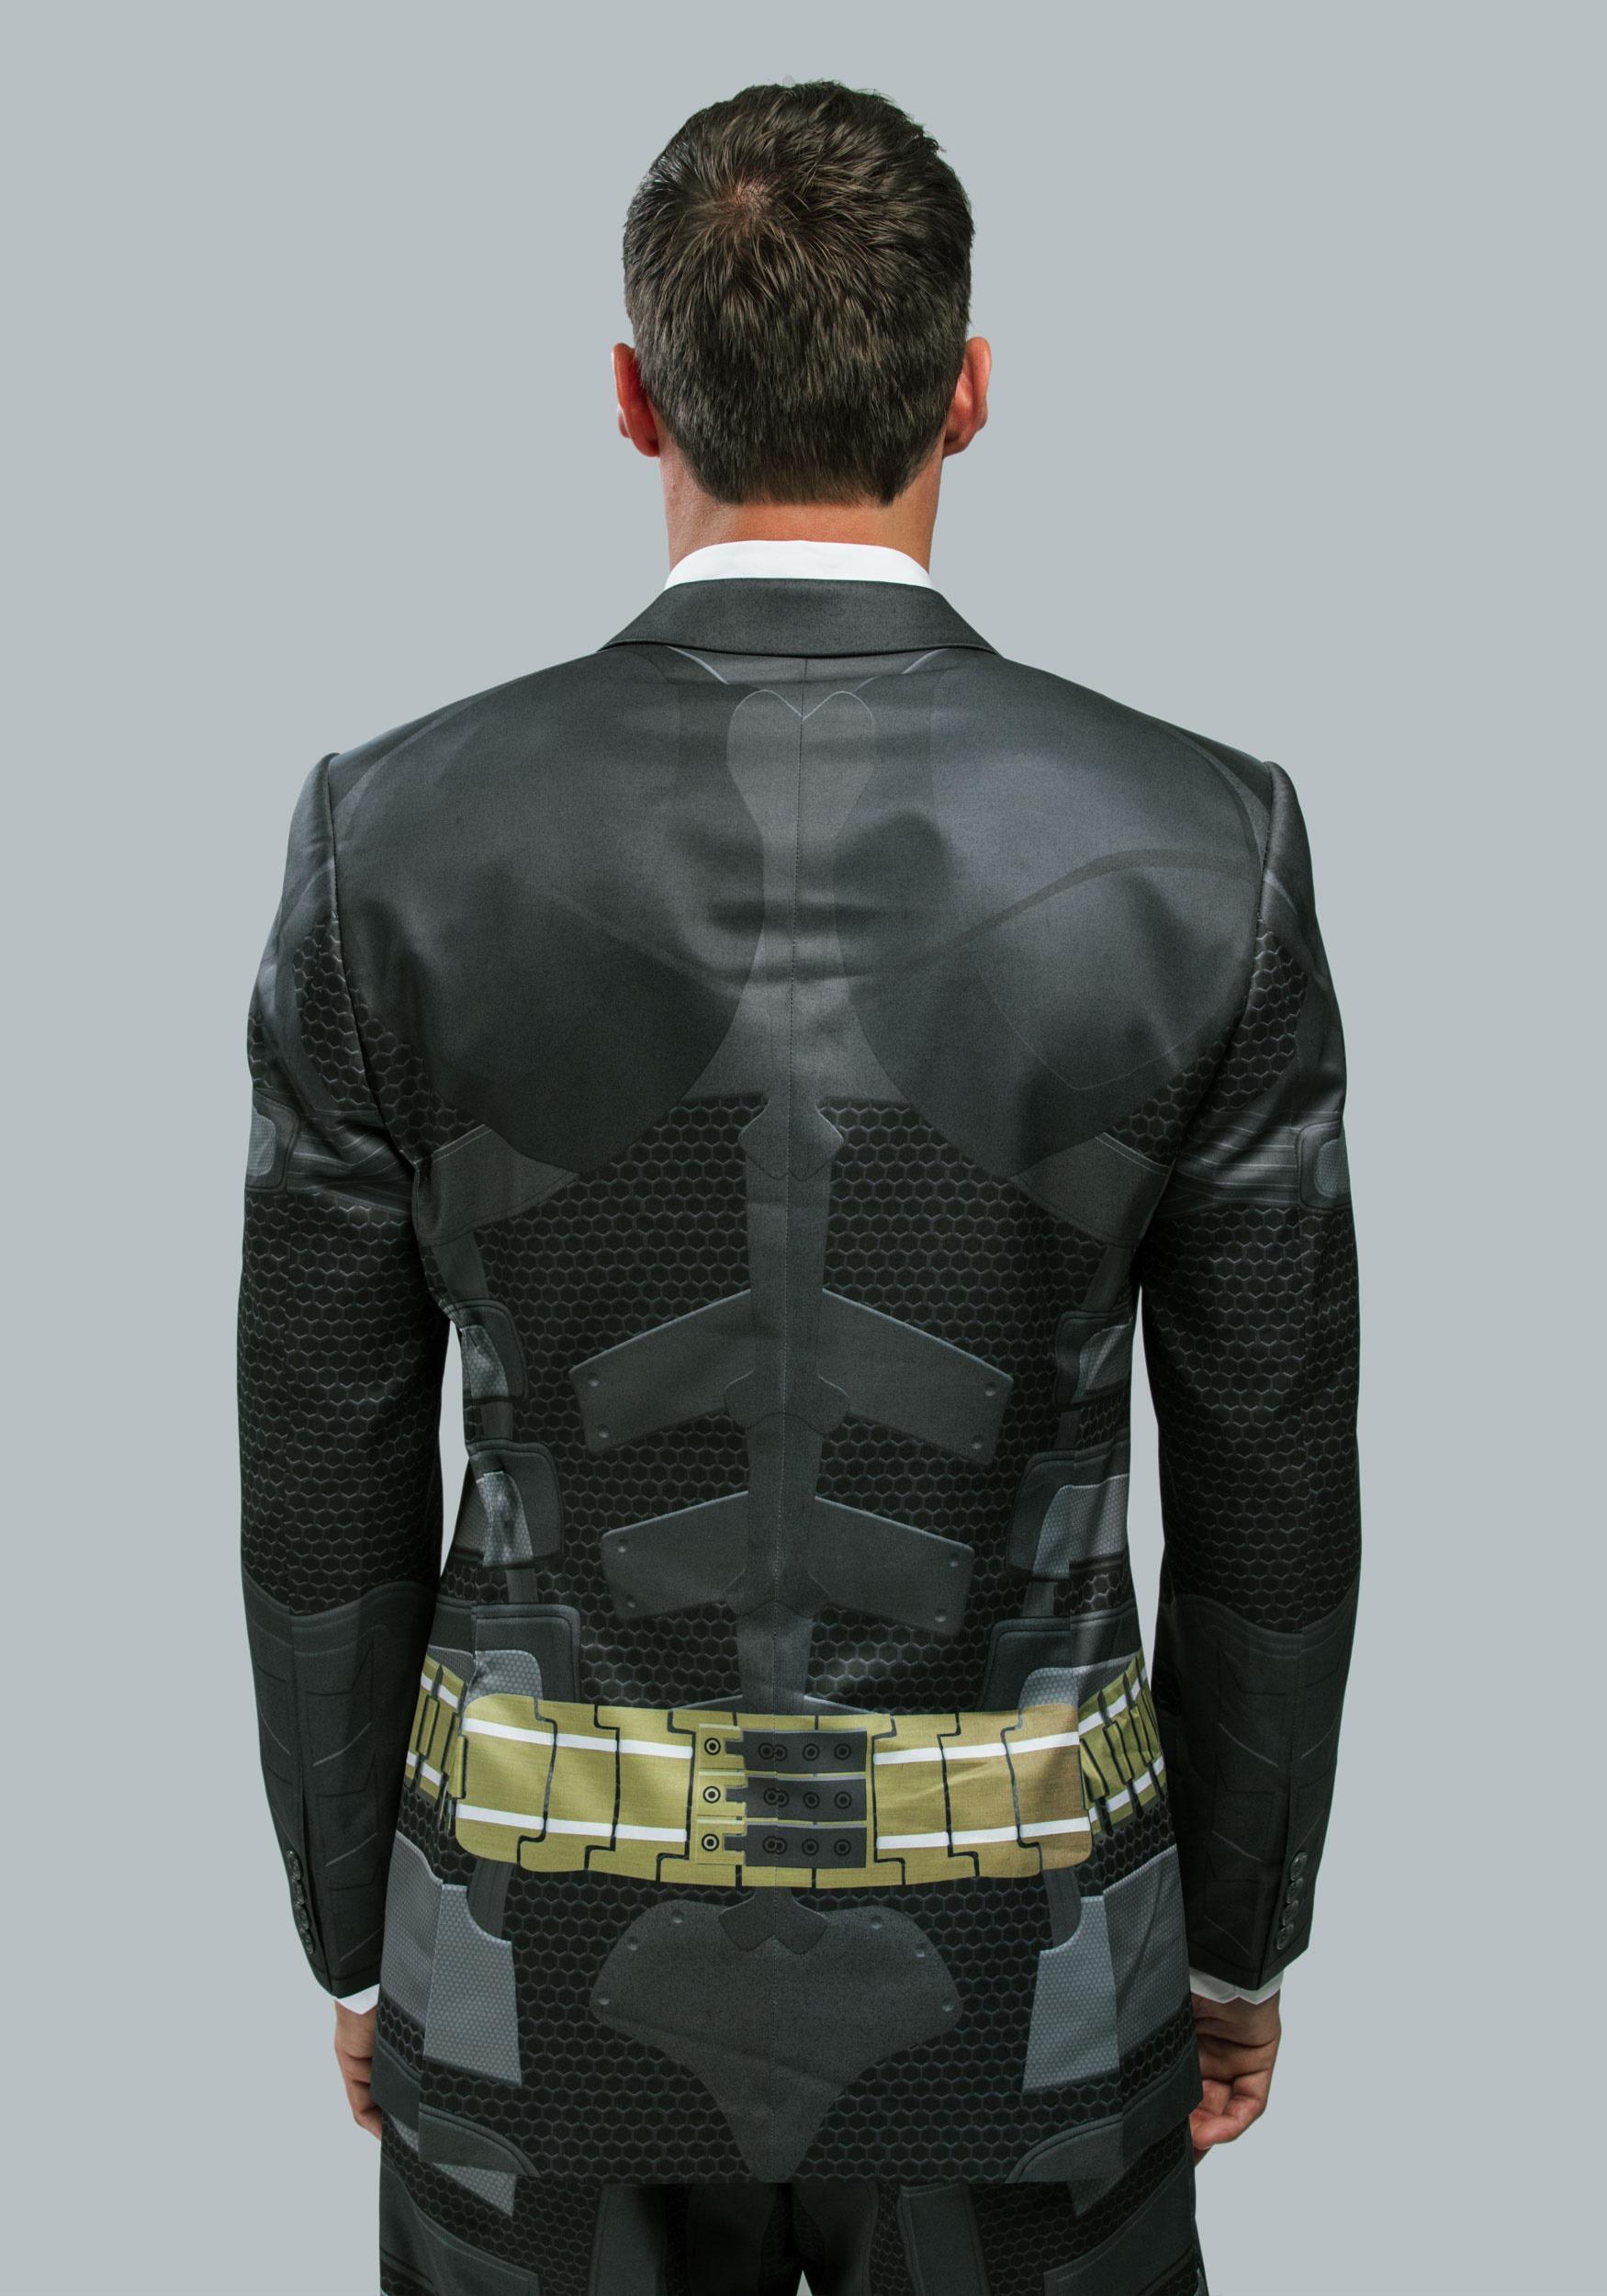 Suit jacket - Dark Knight Suit Jacket Alter Ego